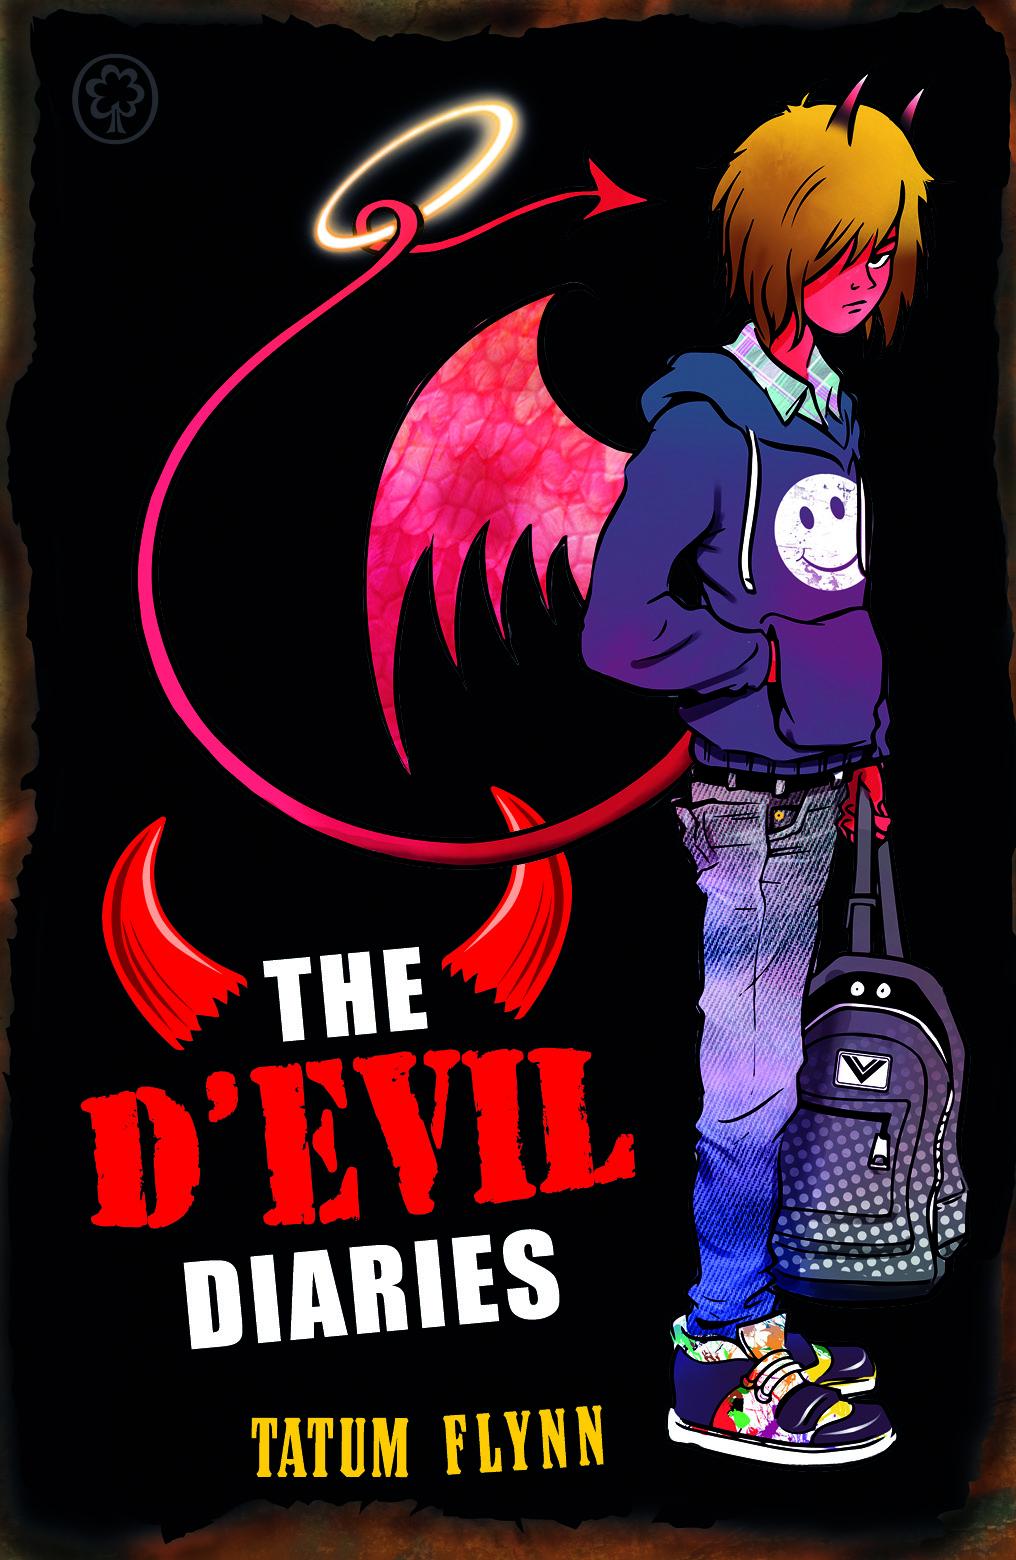 D'Evil_Diaries_cover.jpg